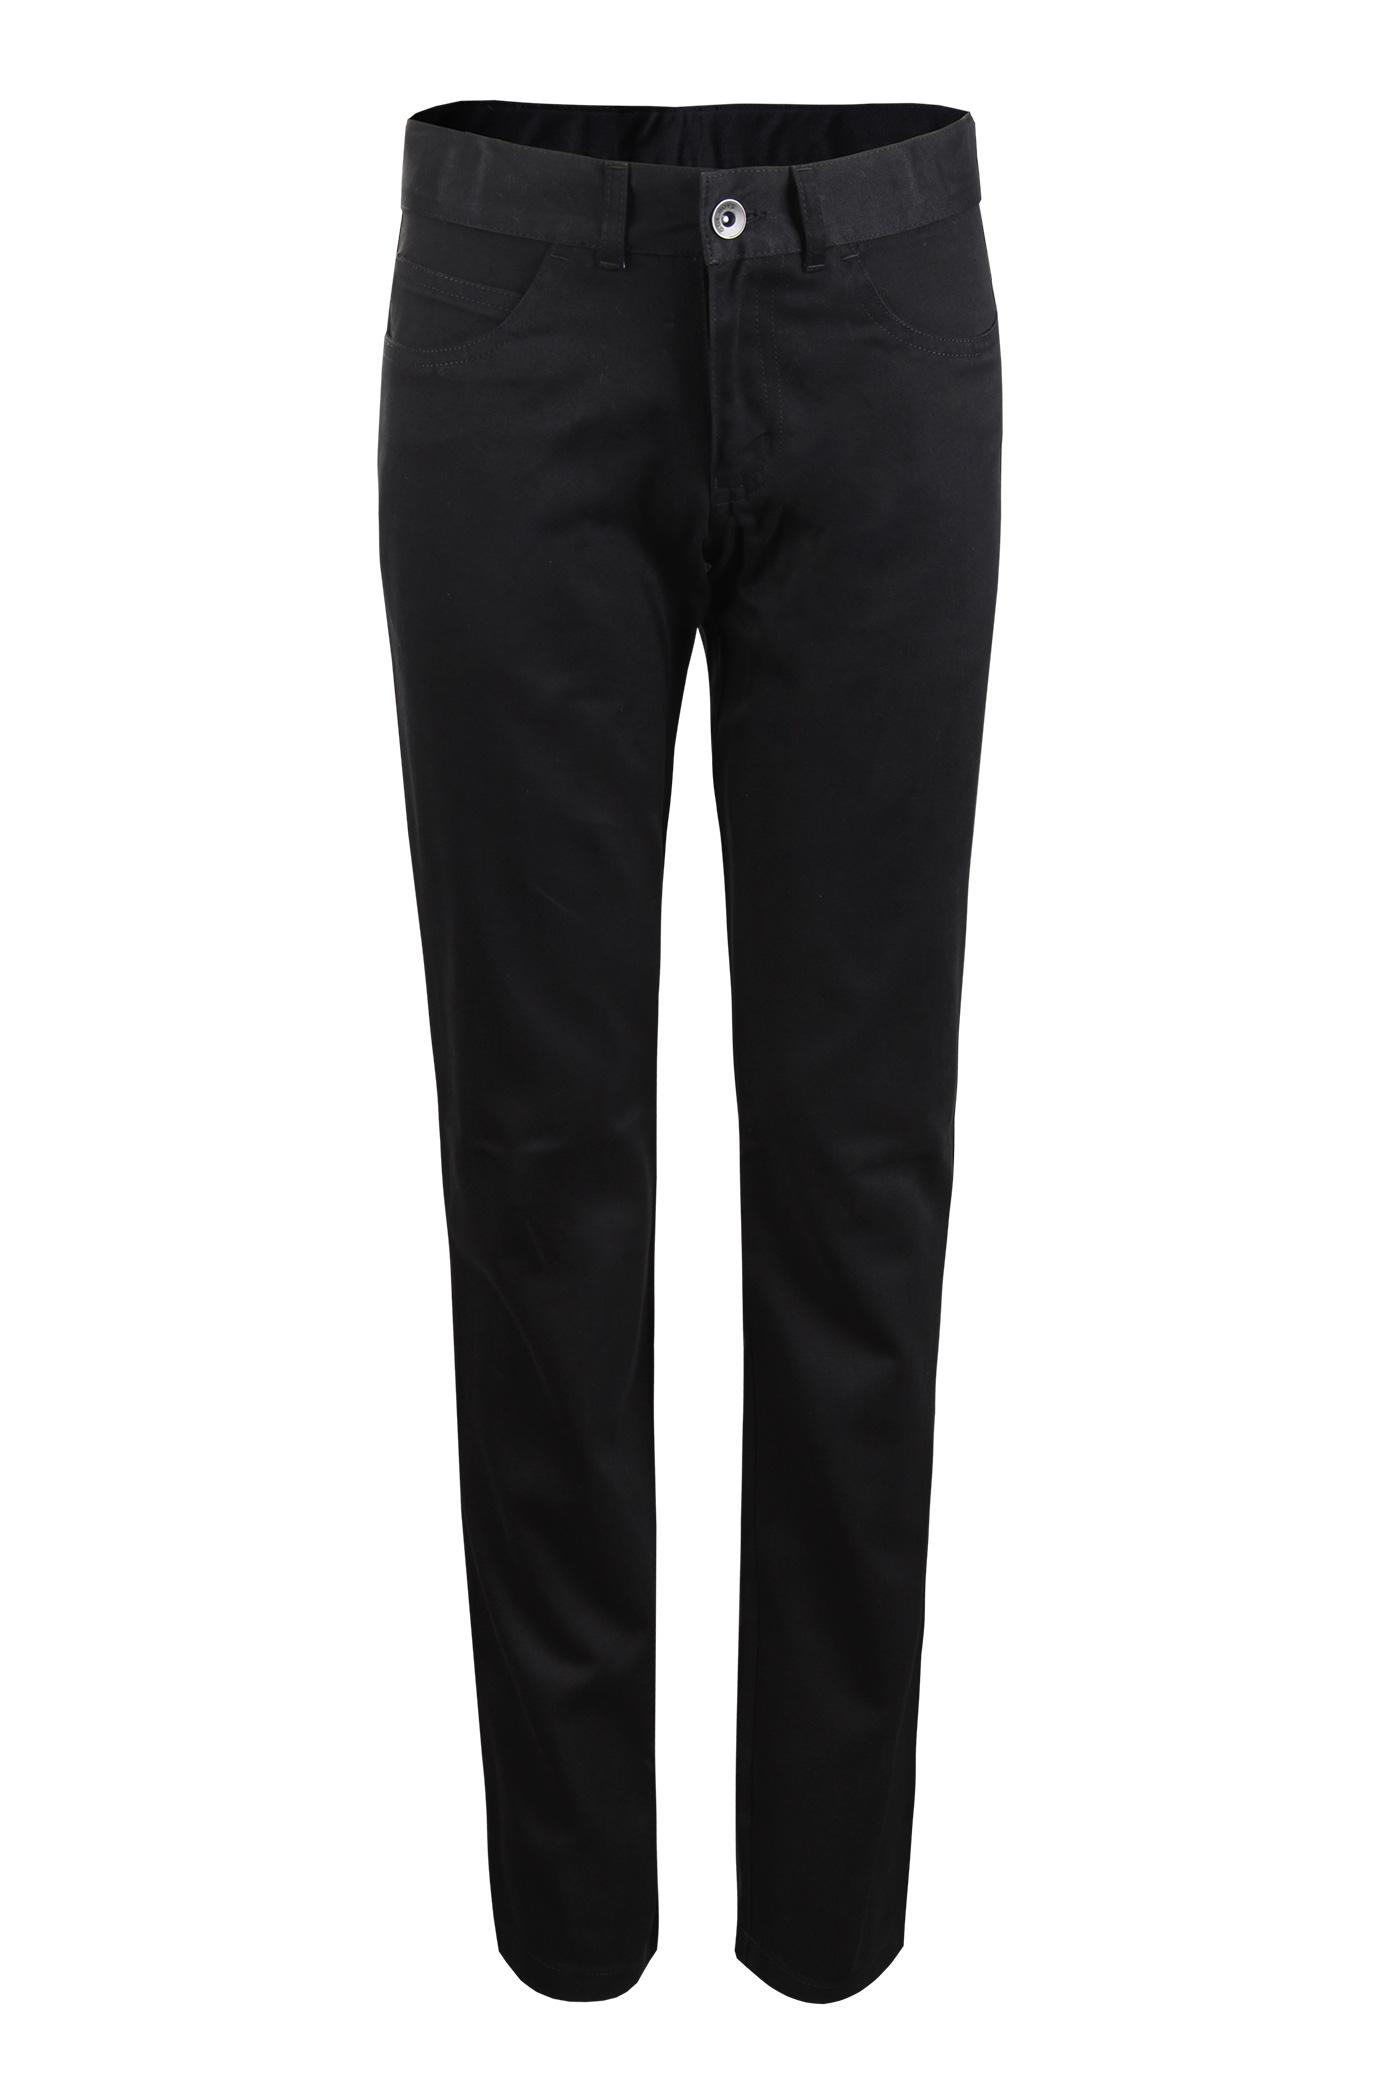 Edel-Jeans Slim-Fit